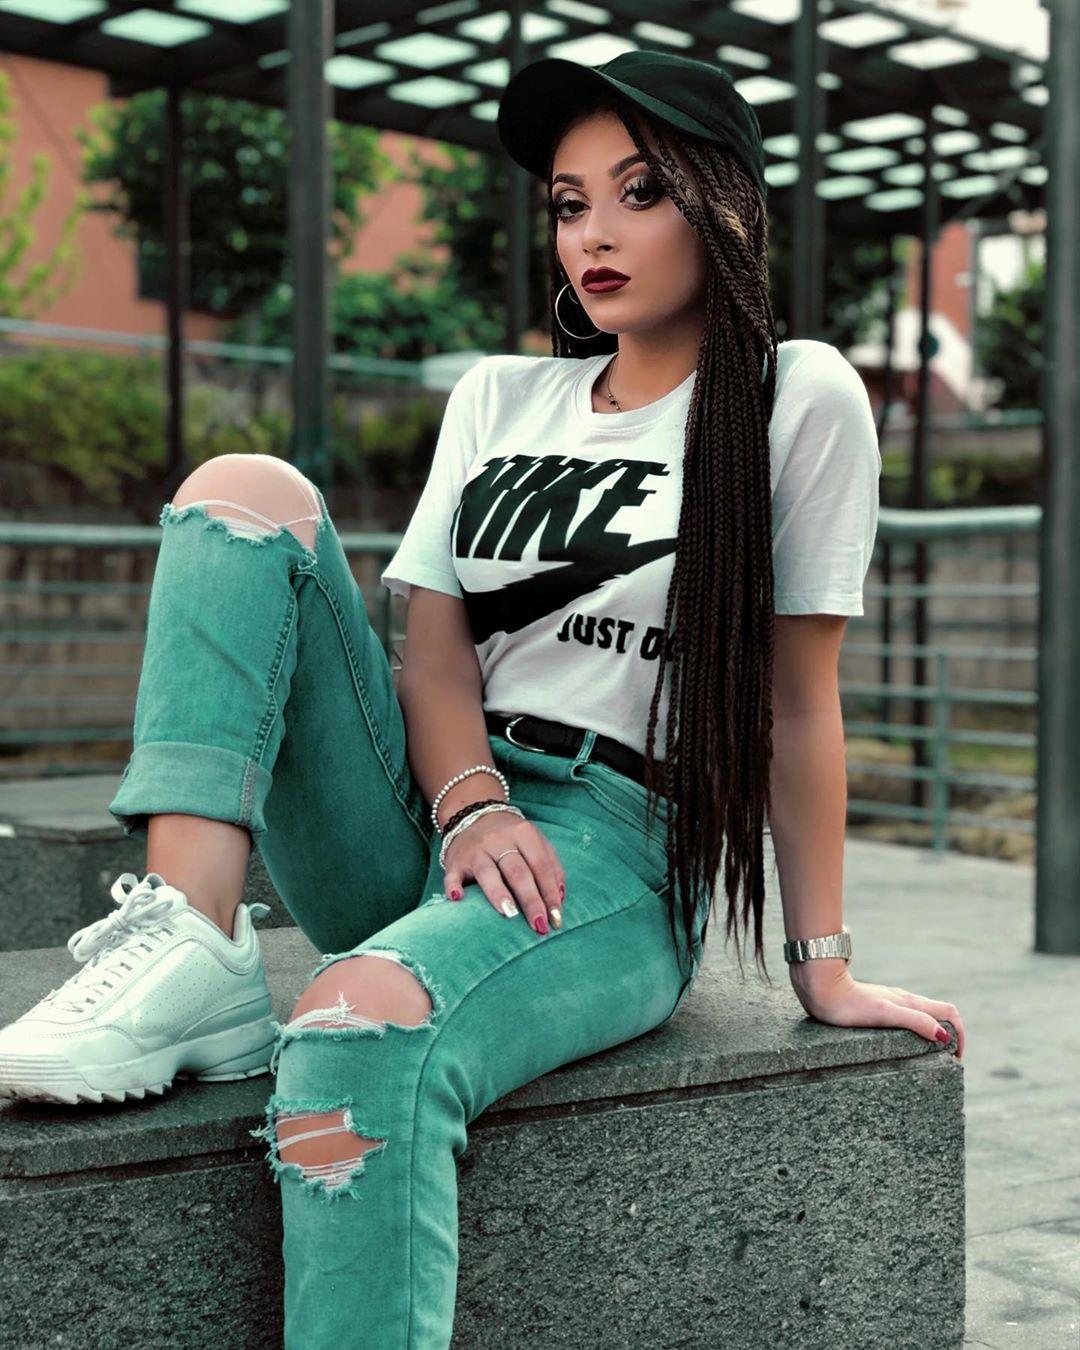 Melissa Porretta Cool and Stylish Girl DP